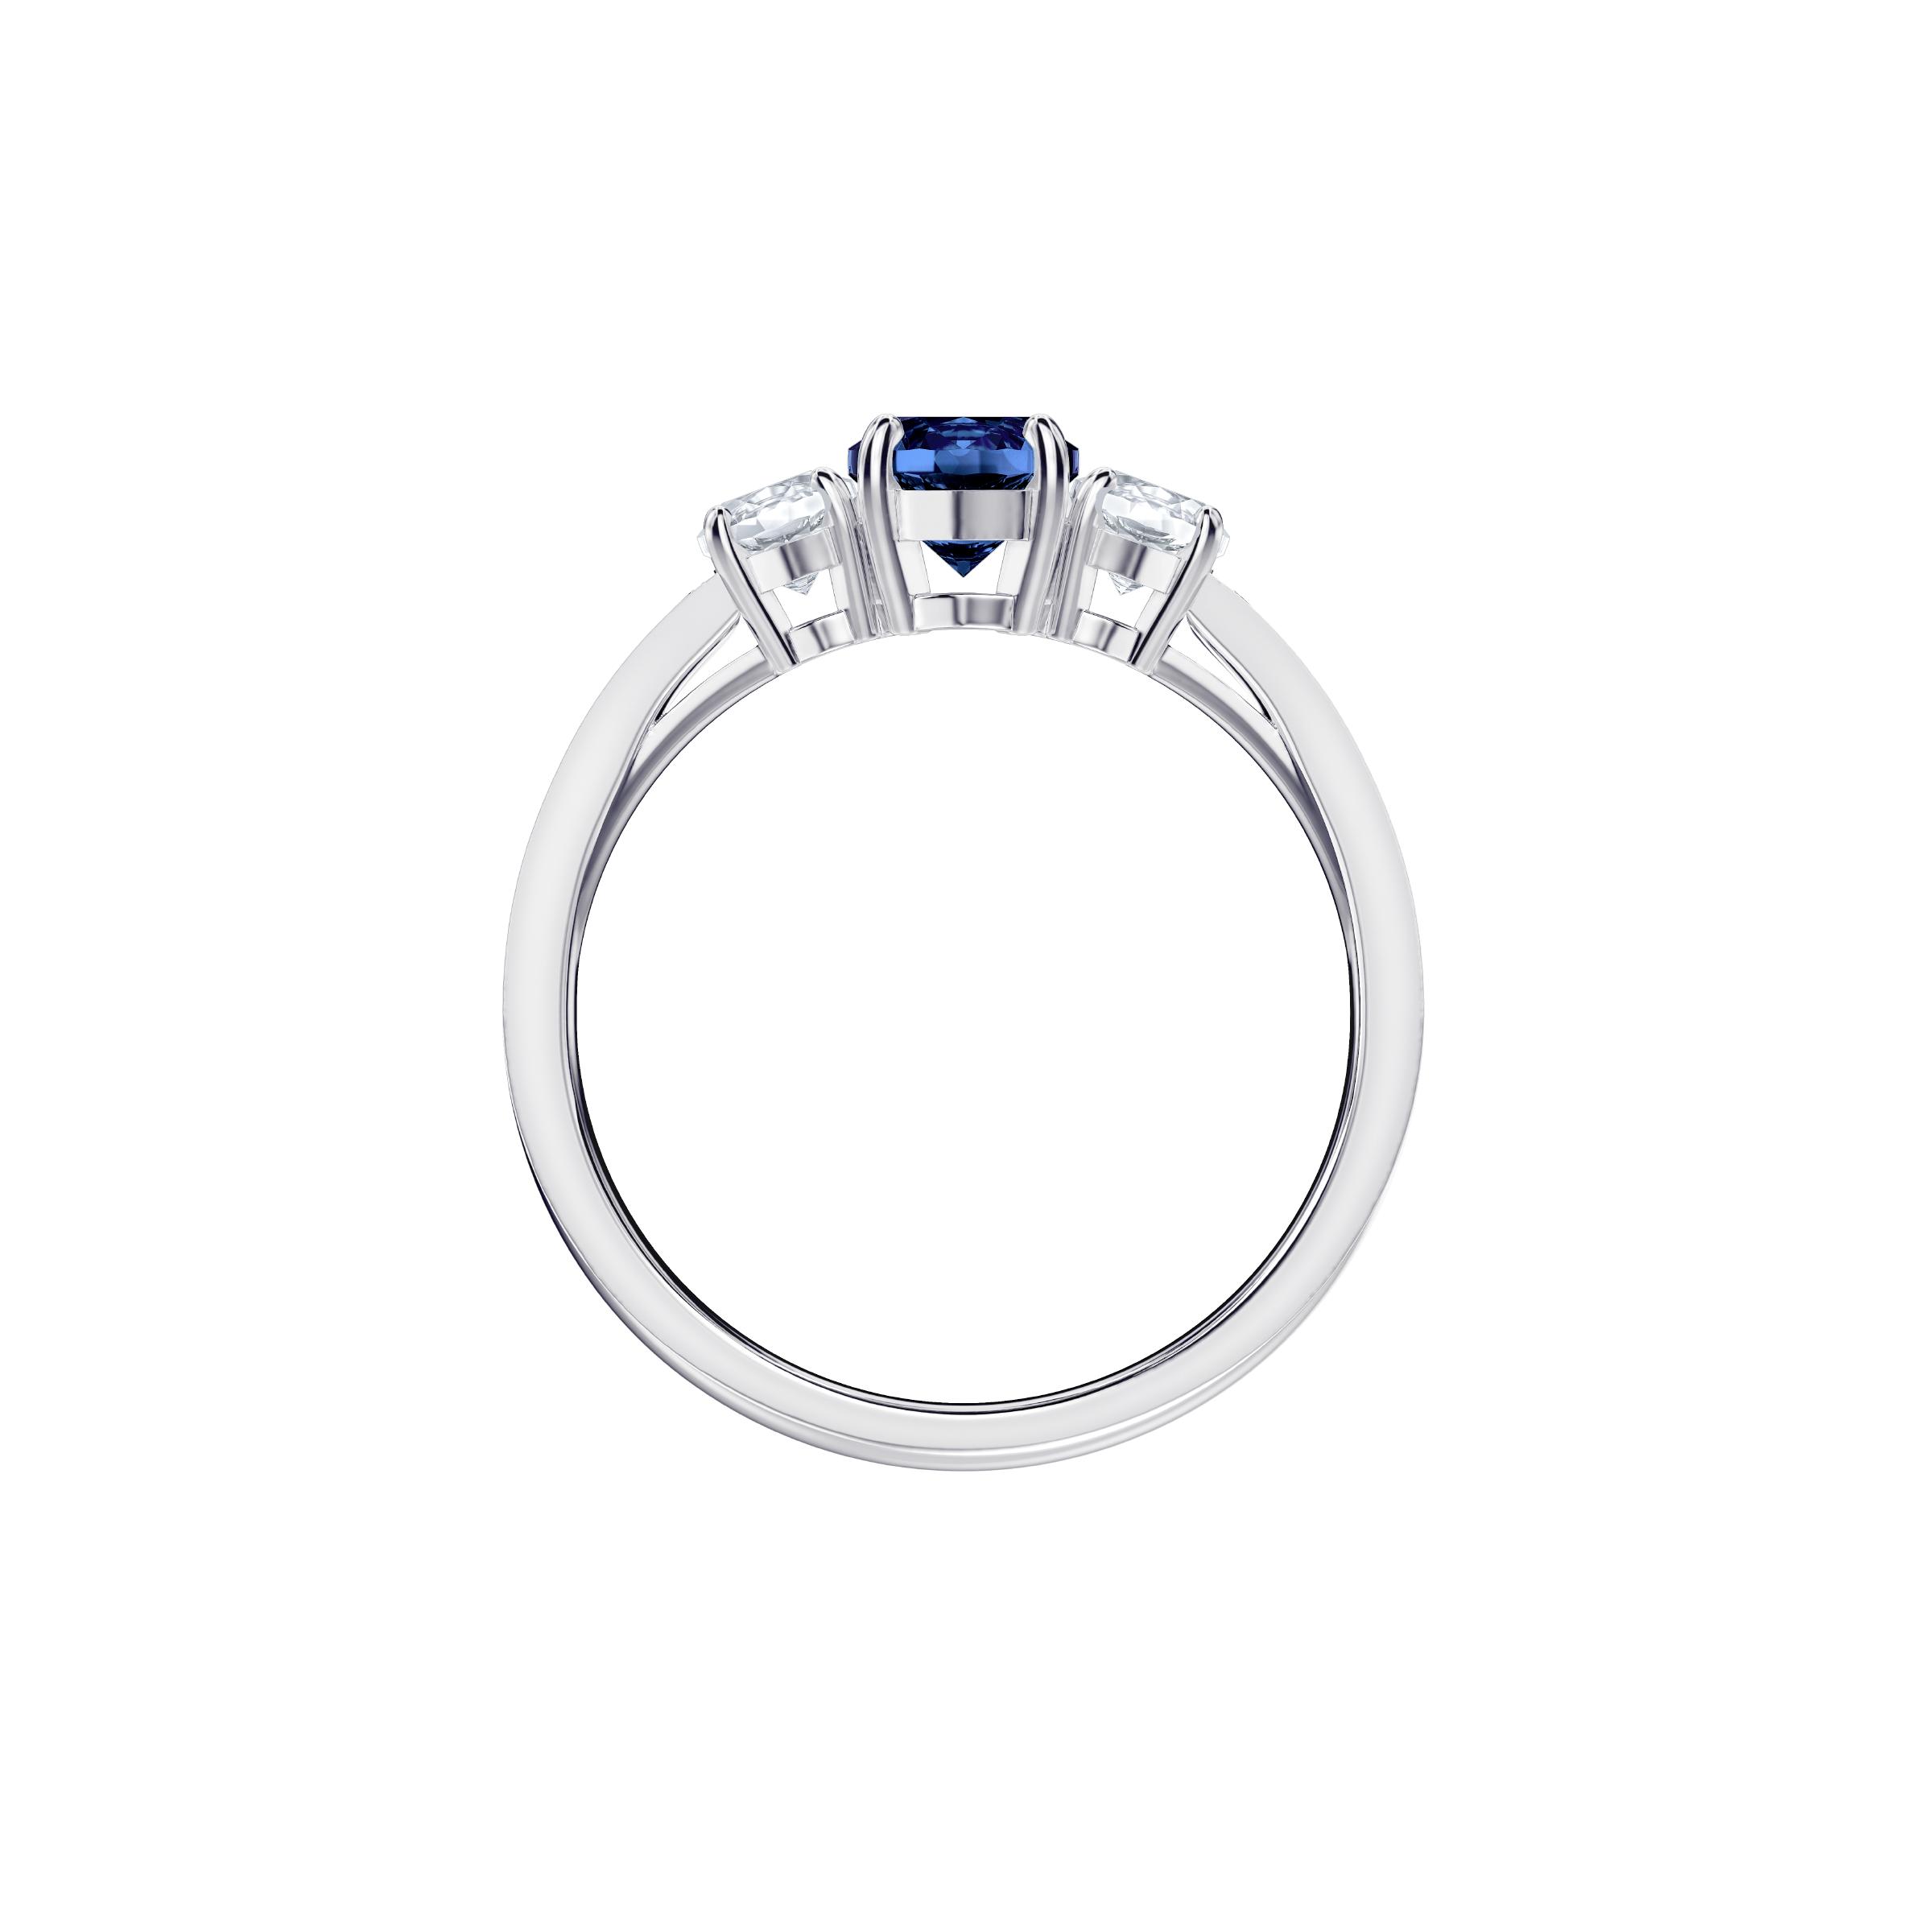 Attract Trilogy Round Ring, Blue, Rhodium Plating